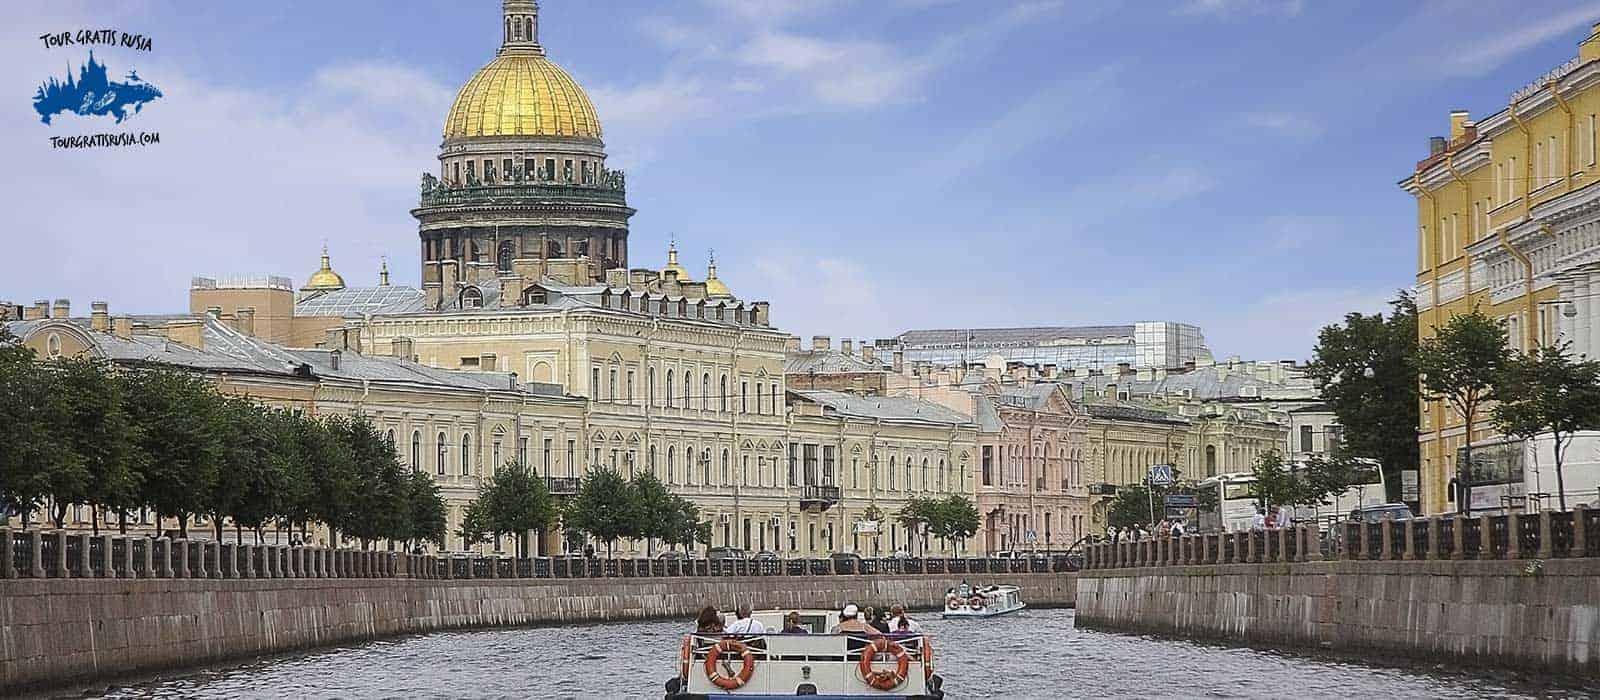 Tour opción larga en San Petersburgo: centro (gratis), metro y tour soviético